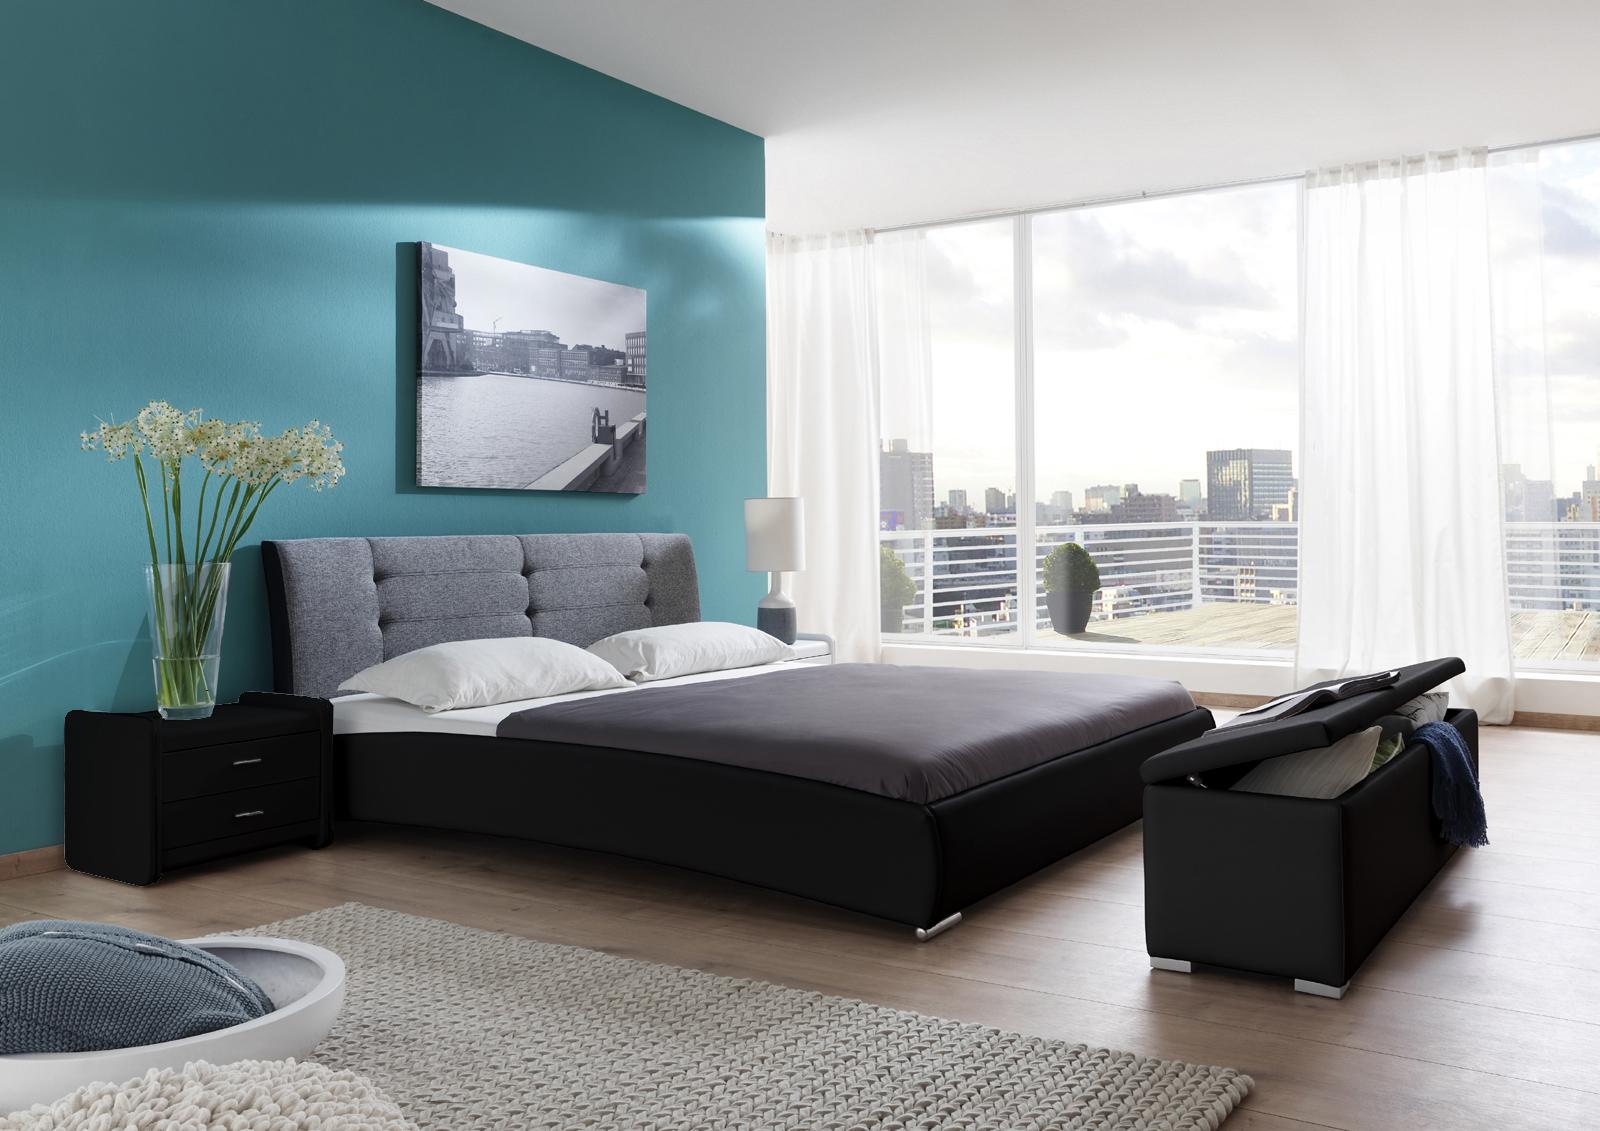 sam polsterbett polsterbett 200 x 200 cm schwarz grau bebop. Black Bedroom Furniture Sets. Home Design Ideas